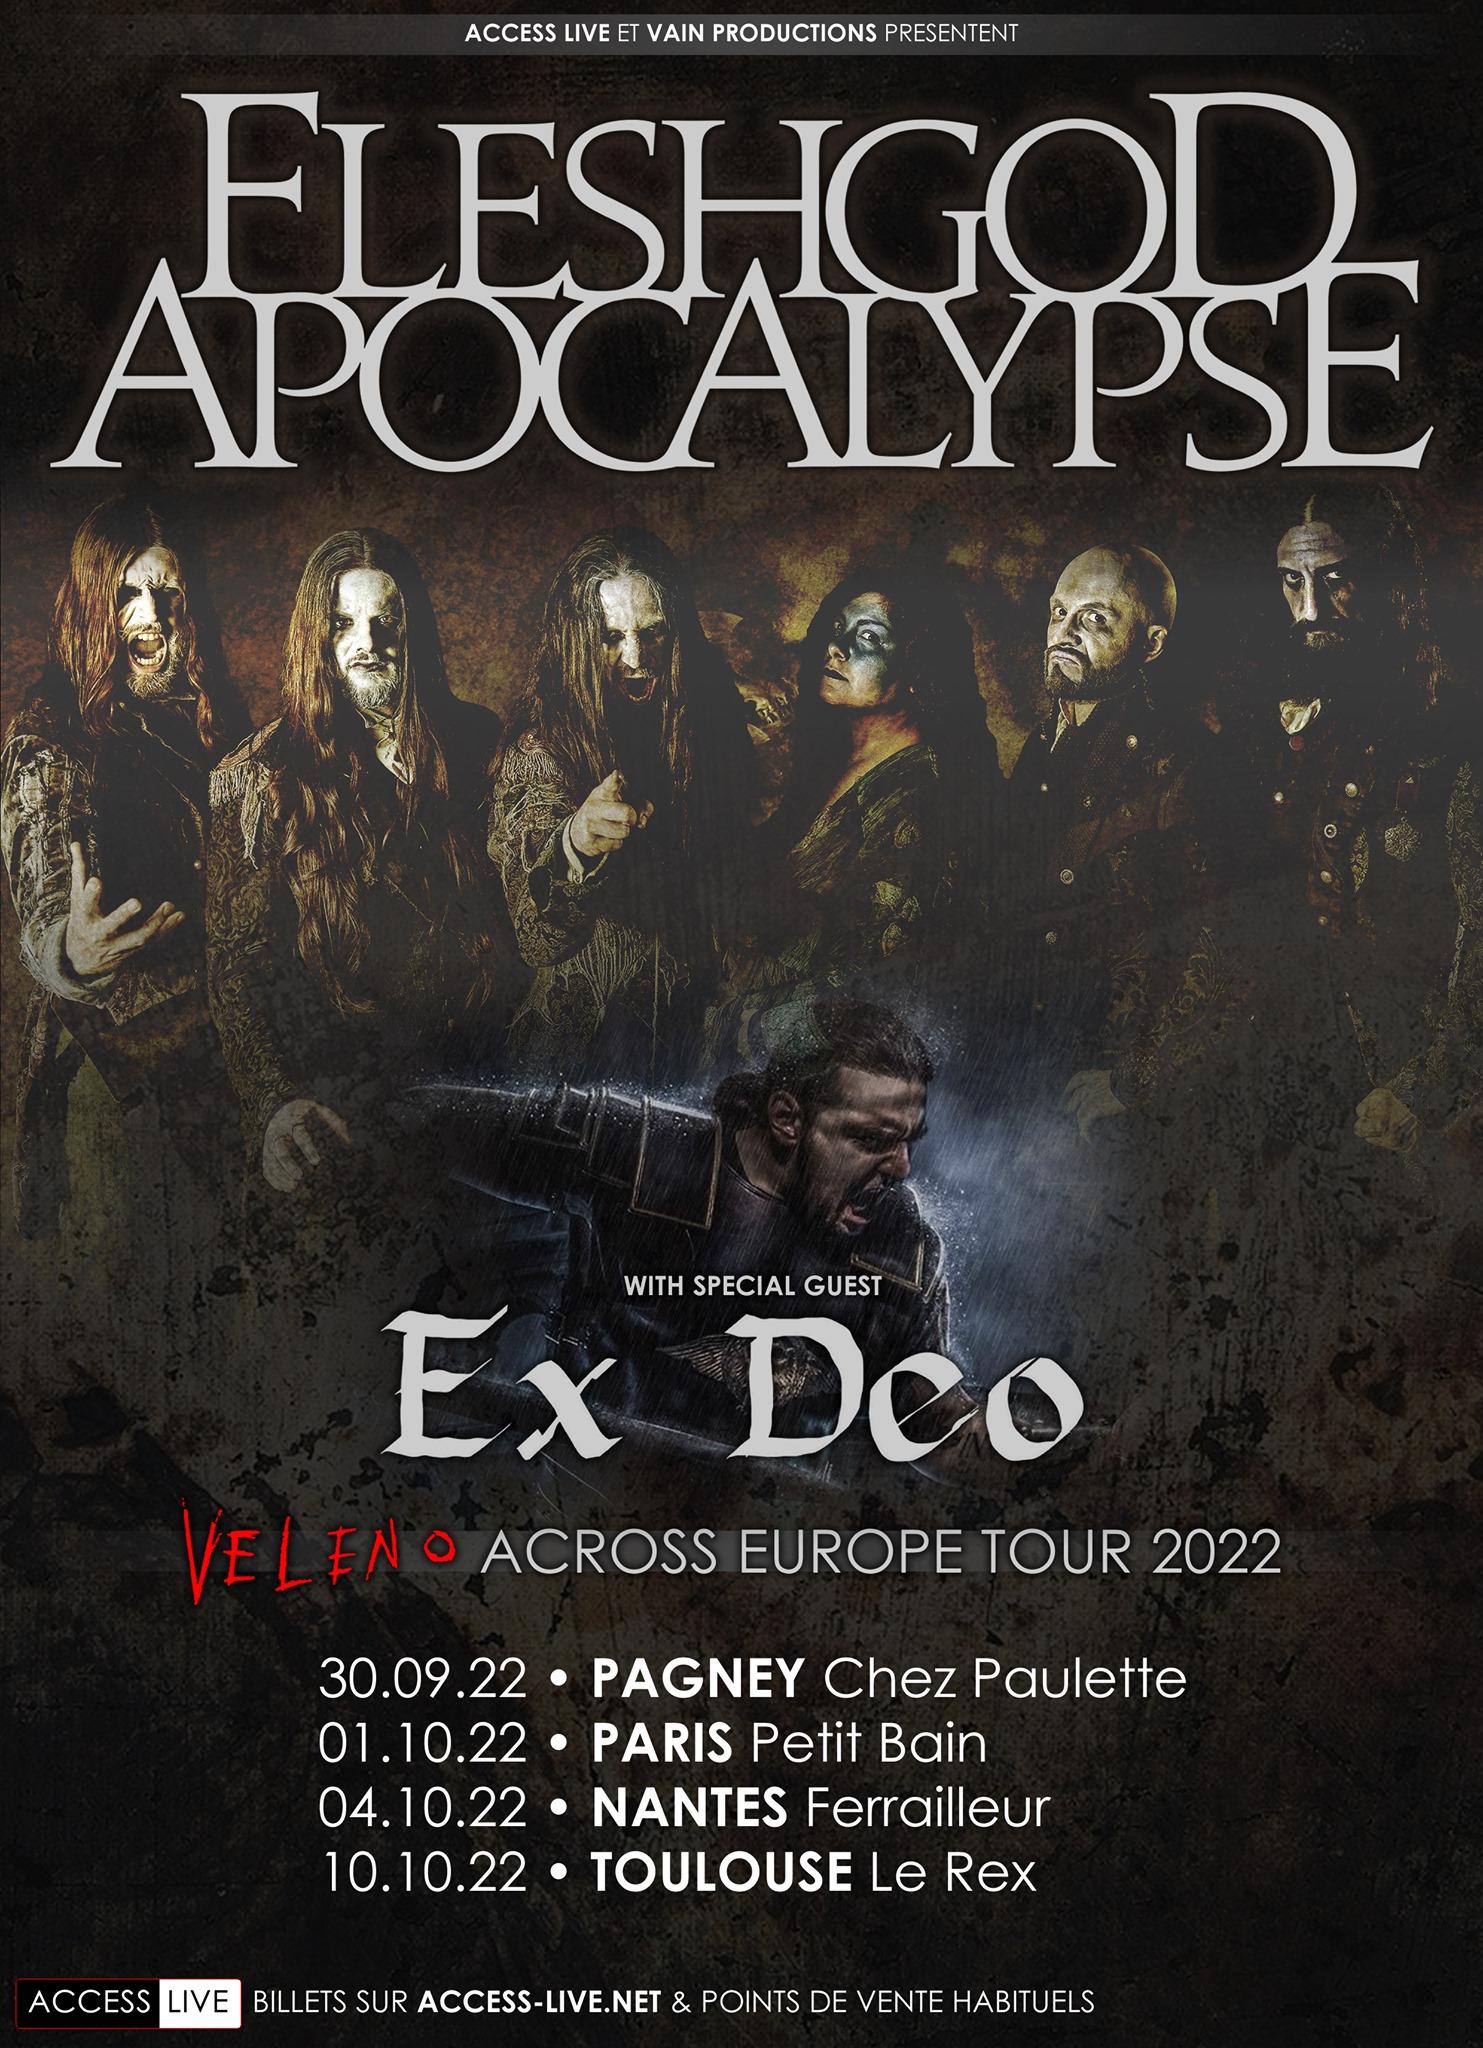 Fleshgod Apocalypse / Ex Deo